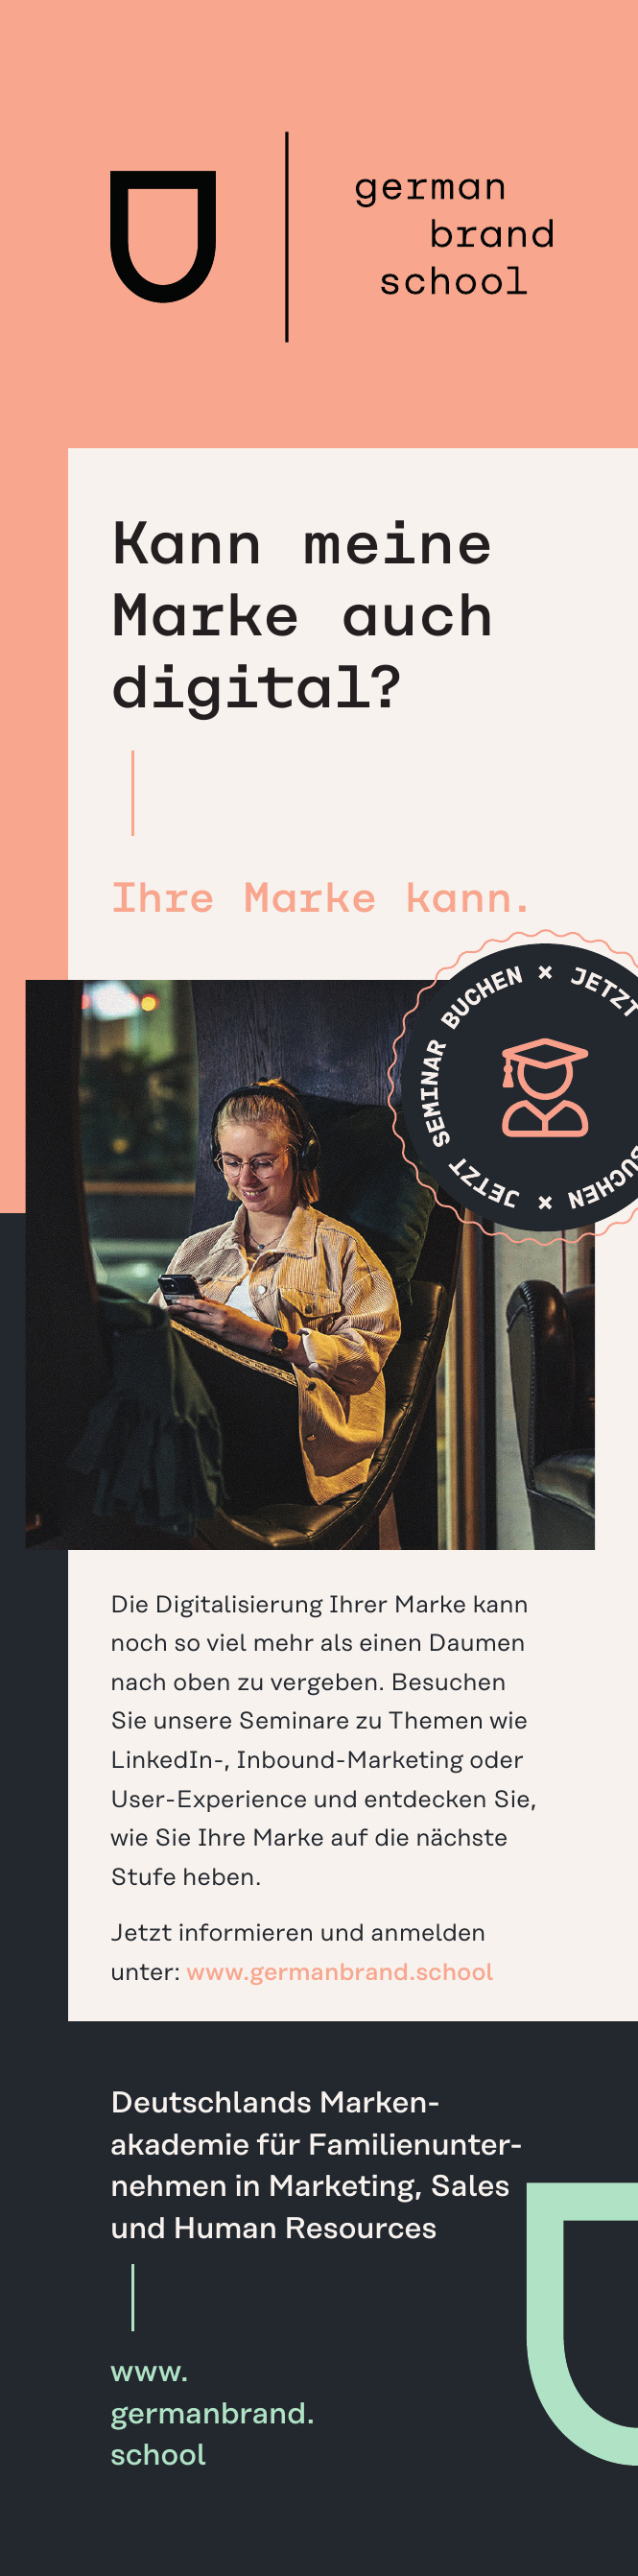 german brand school